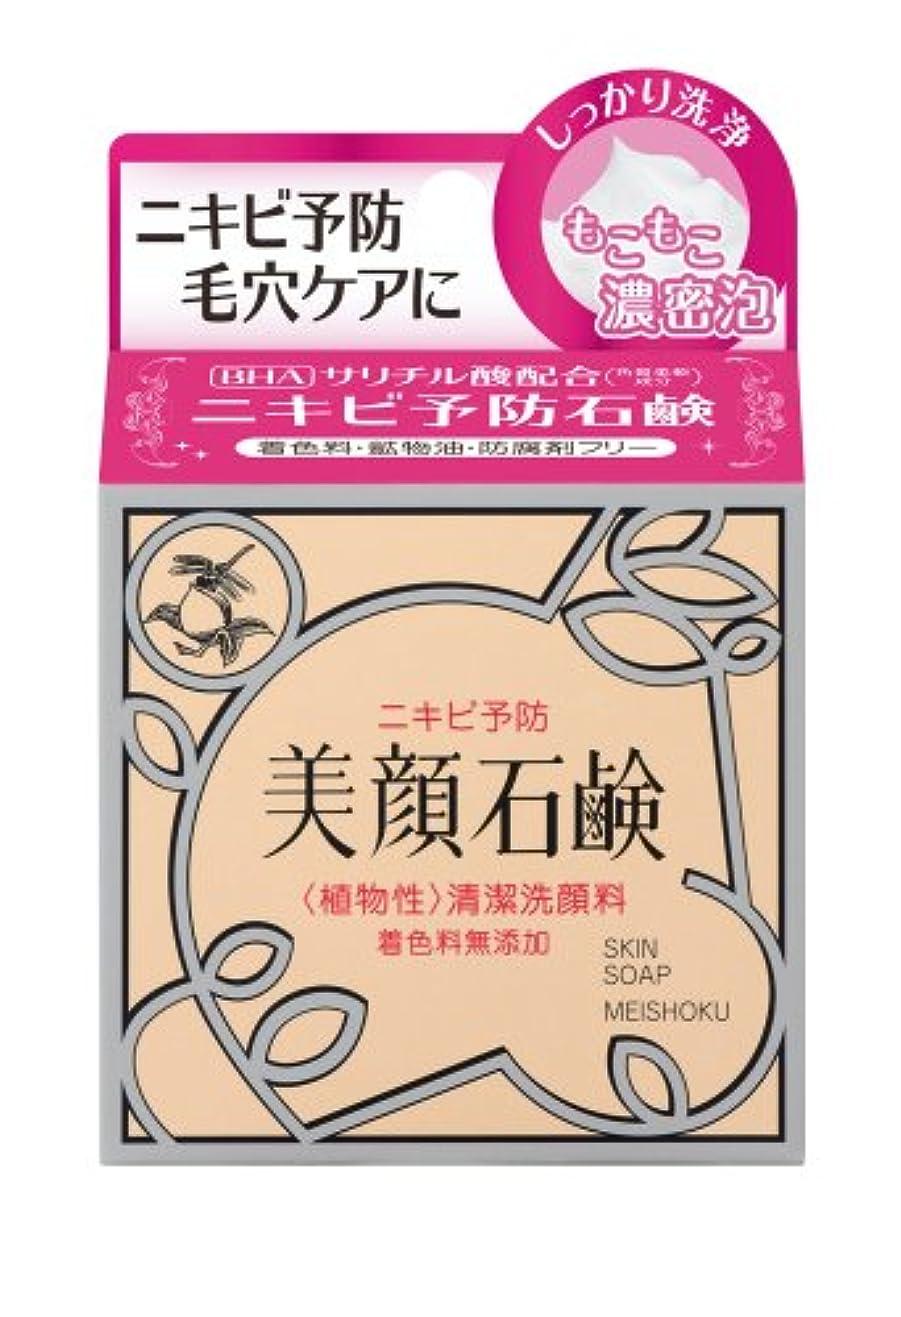 重くする踏み台逸話明色化粧品 明色美顔薬用石鹸 80g (医薬部外品)